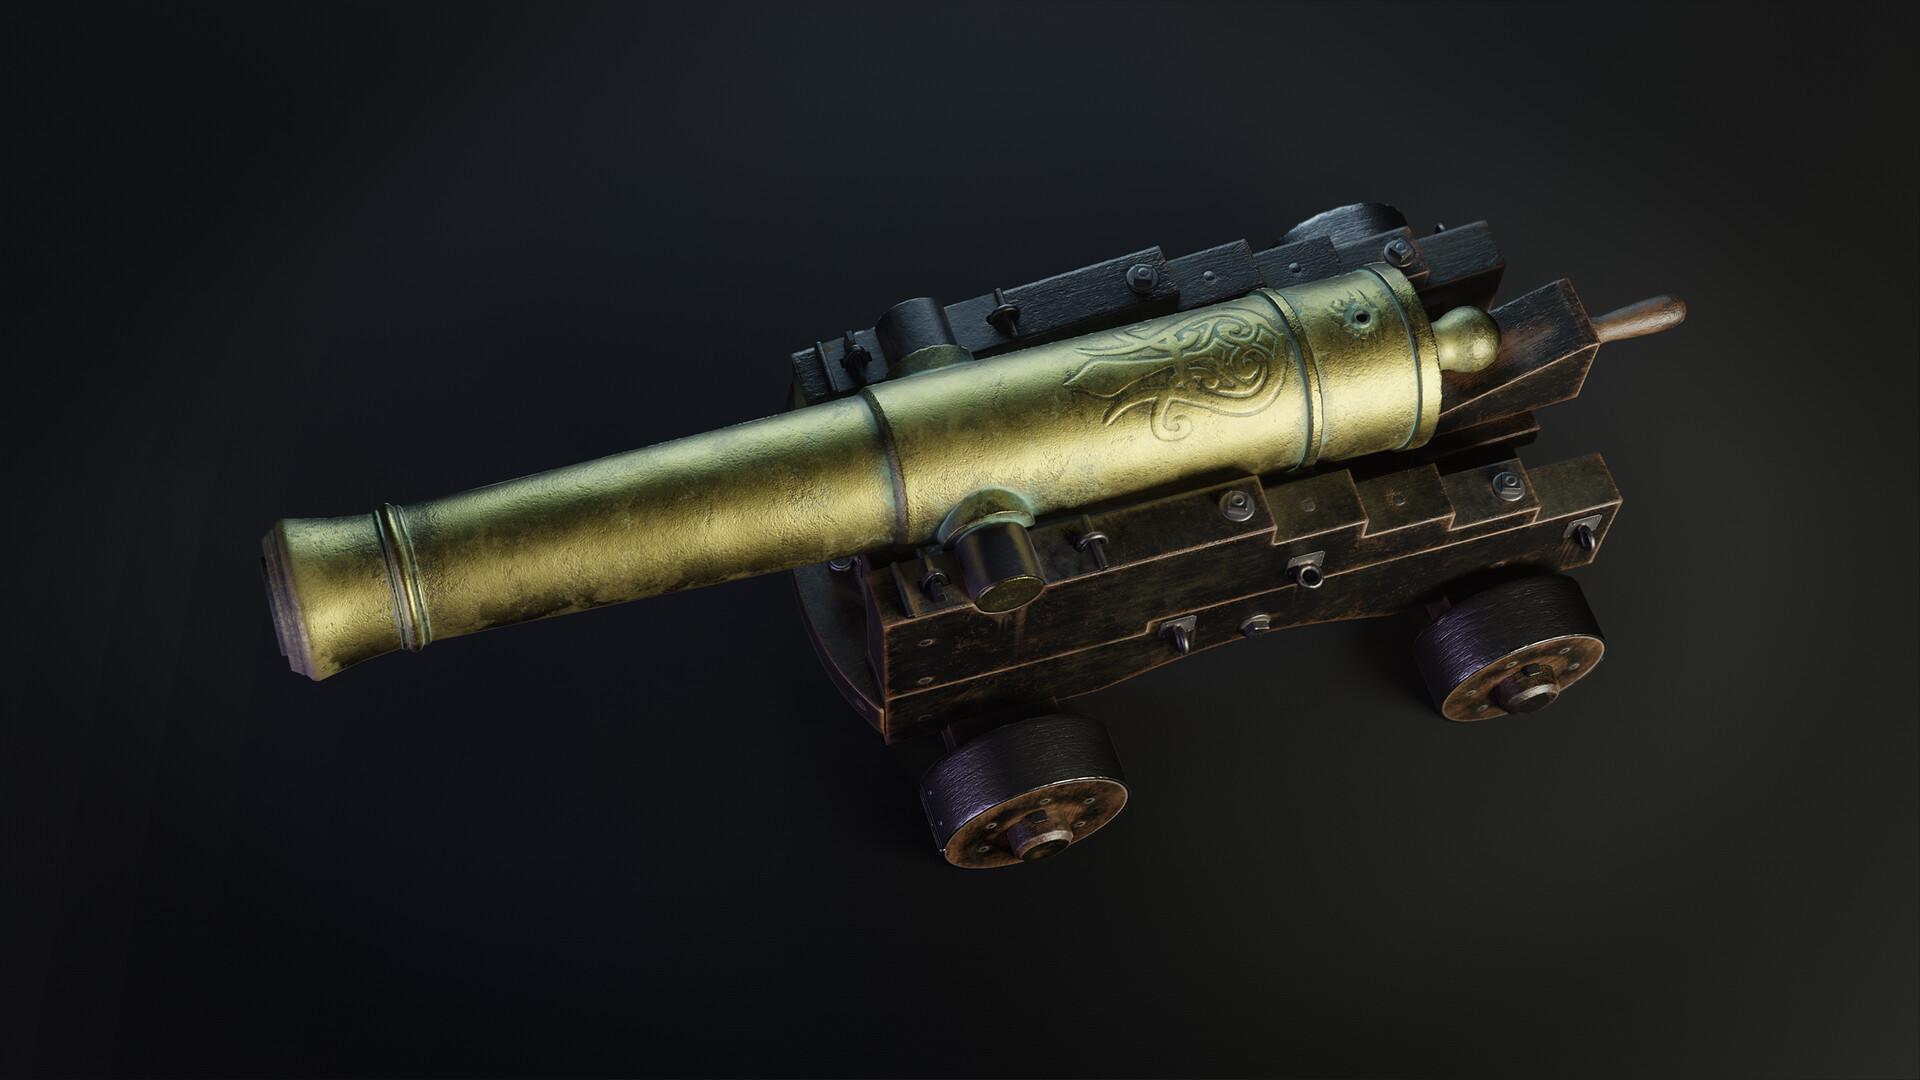 Pavel mazanik naval cannon render 02